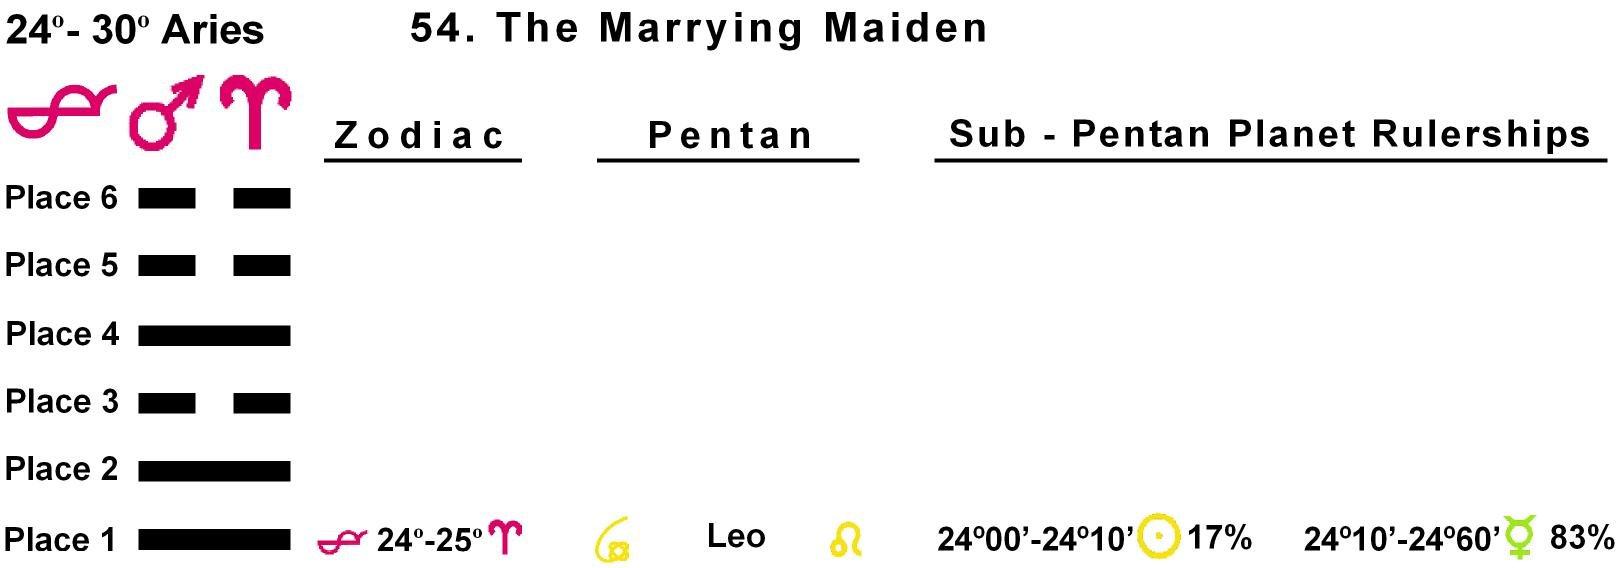 Pent-lines-01AR 24-25 Hx-54 Marrying Maiden